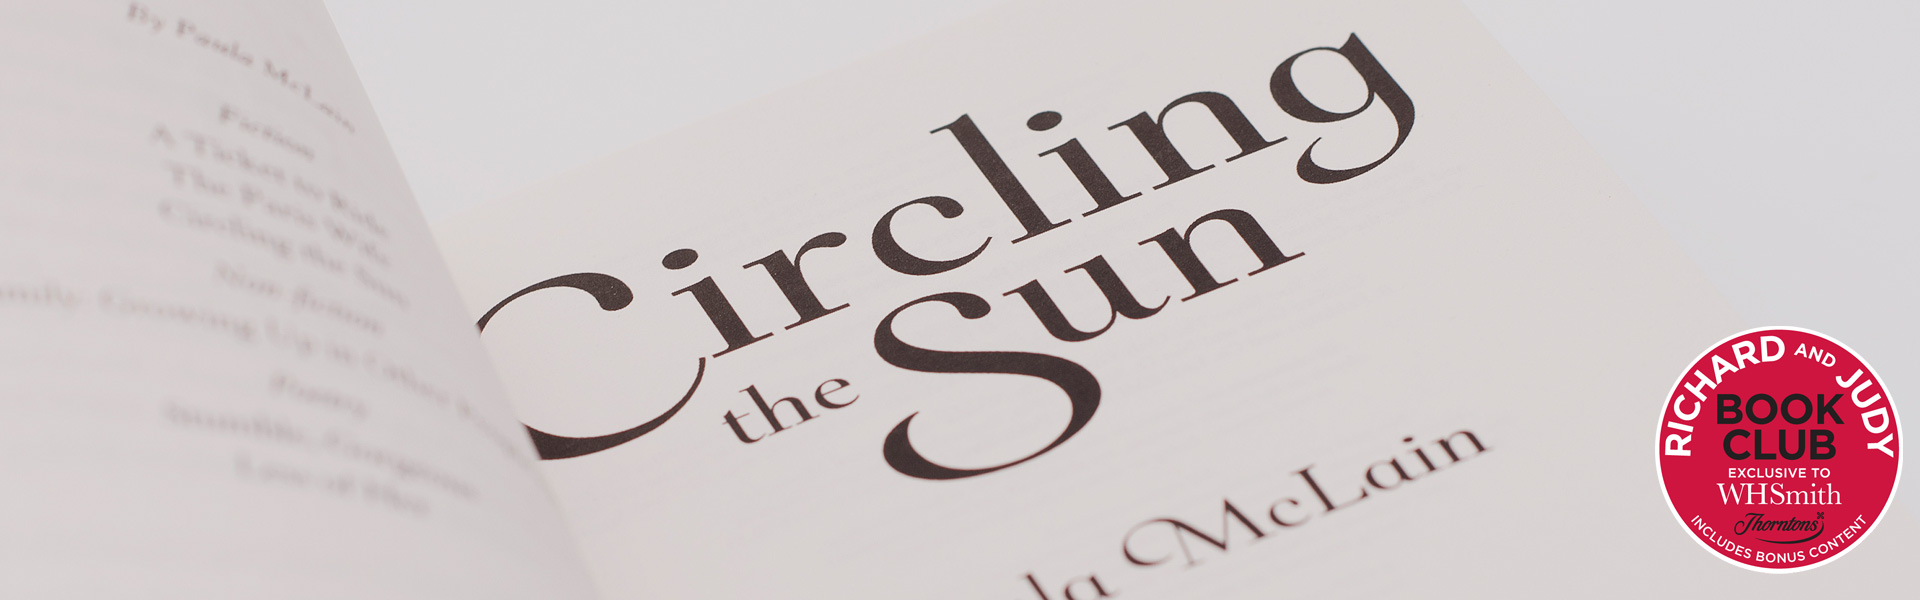 Richard and Judy Podcast: Paula McLain discusses Circling the Sun